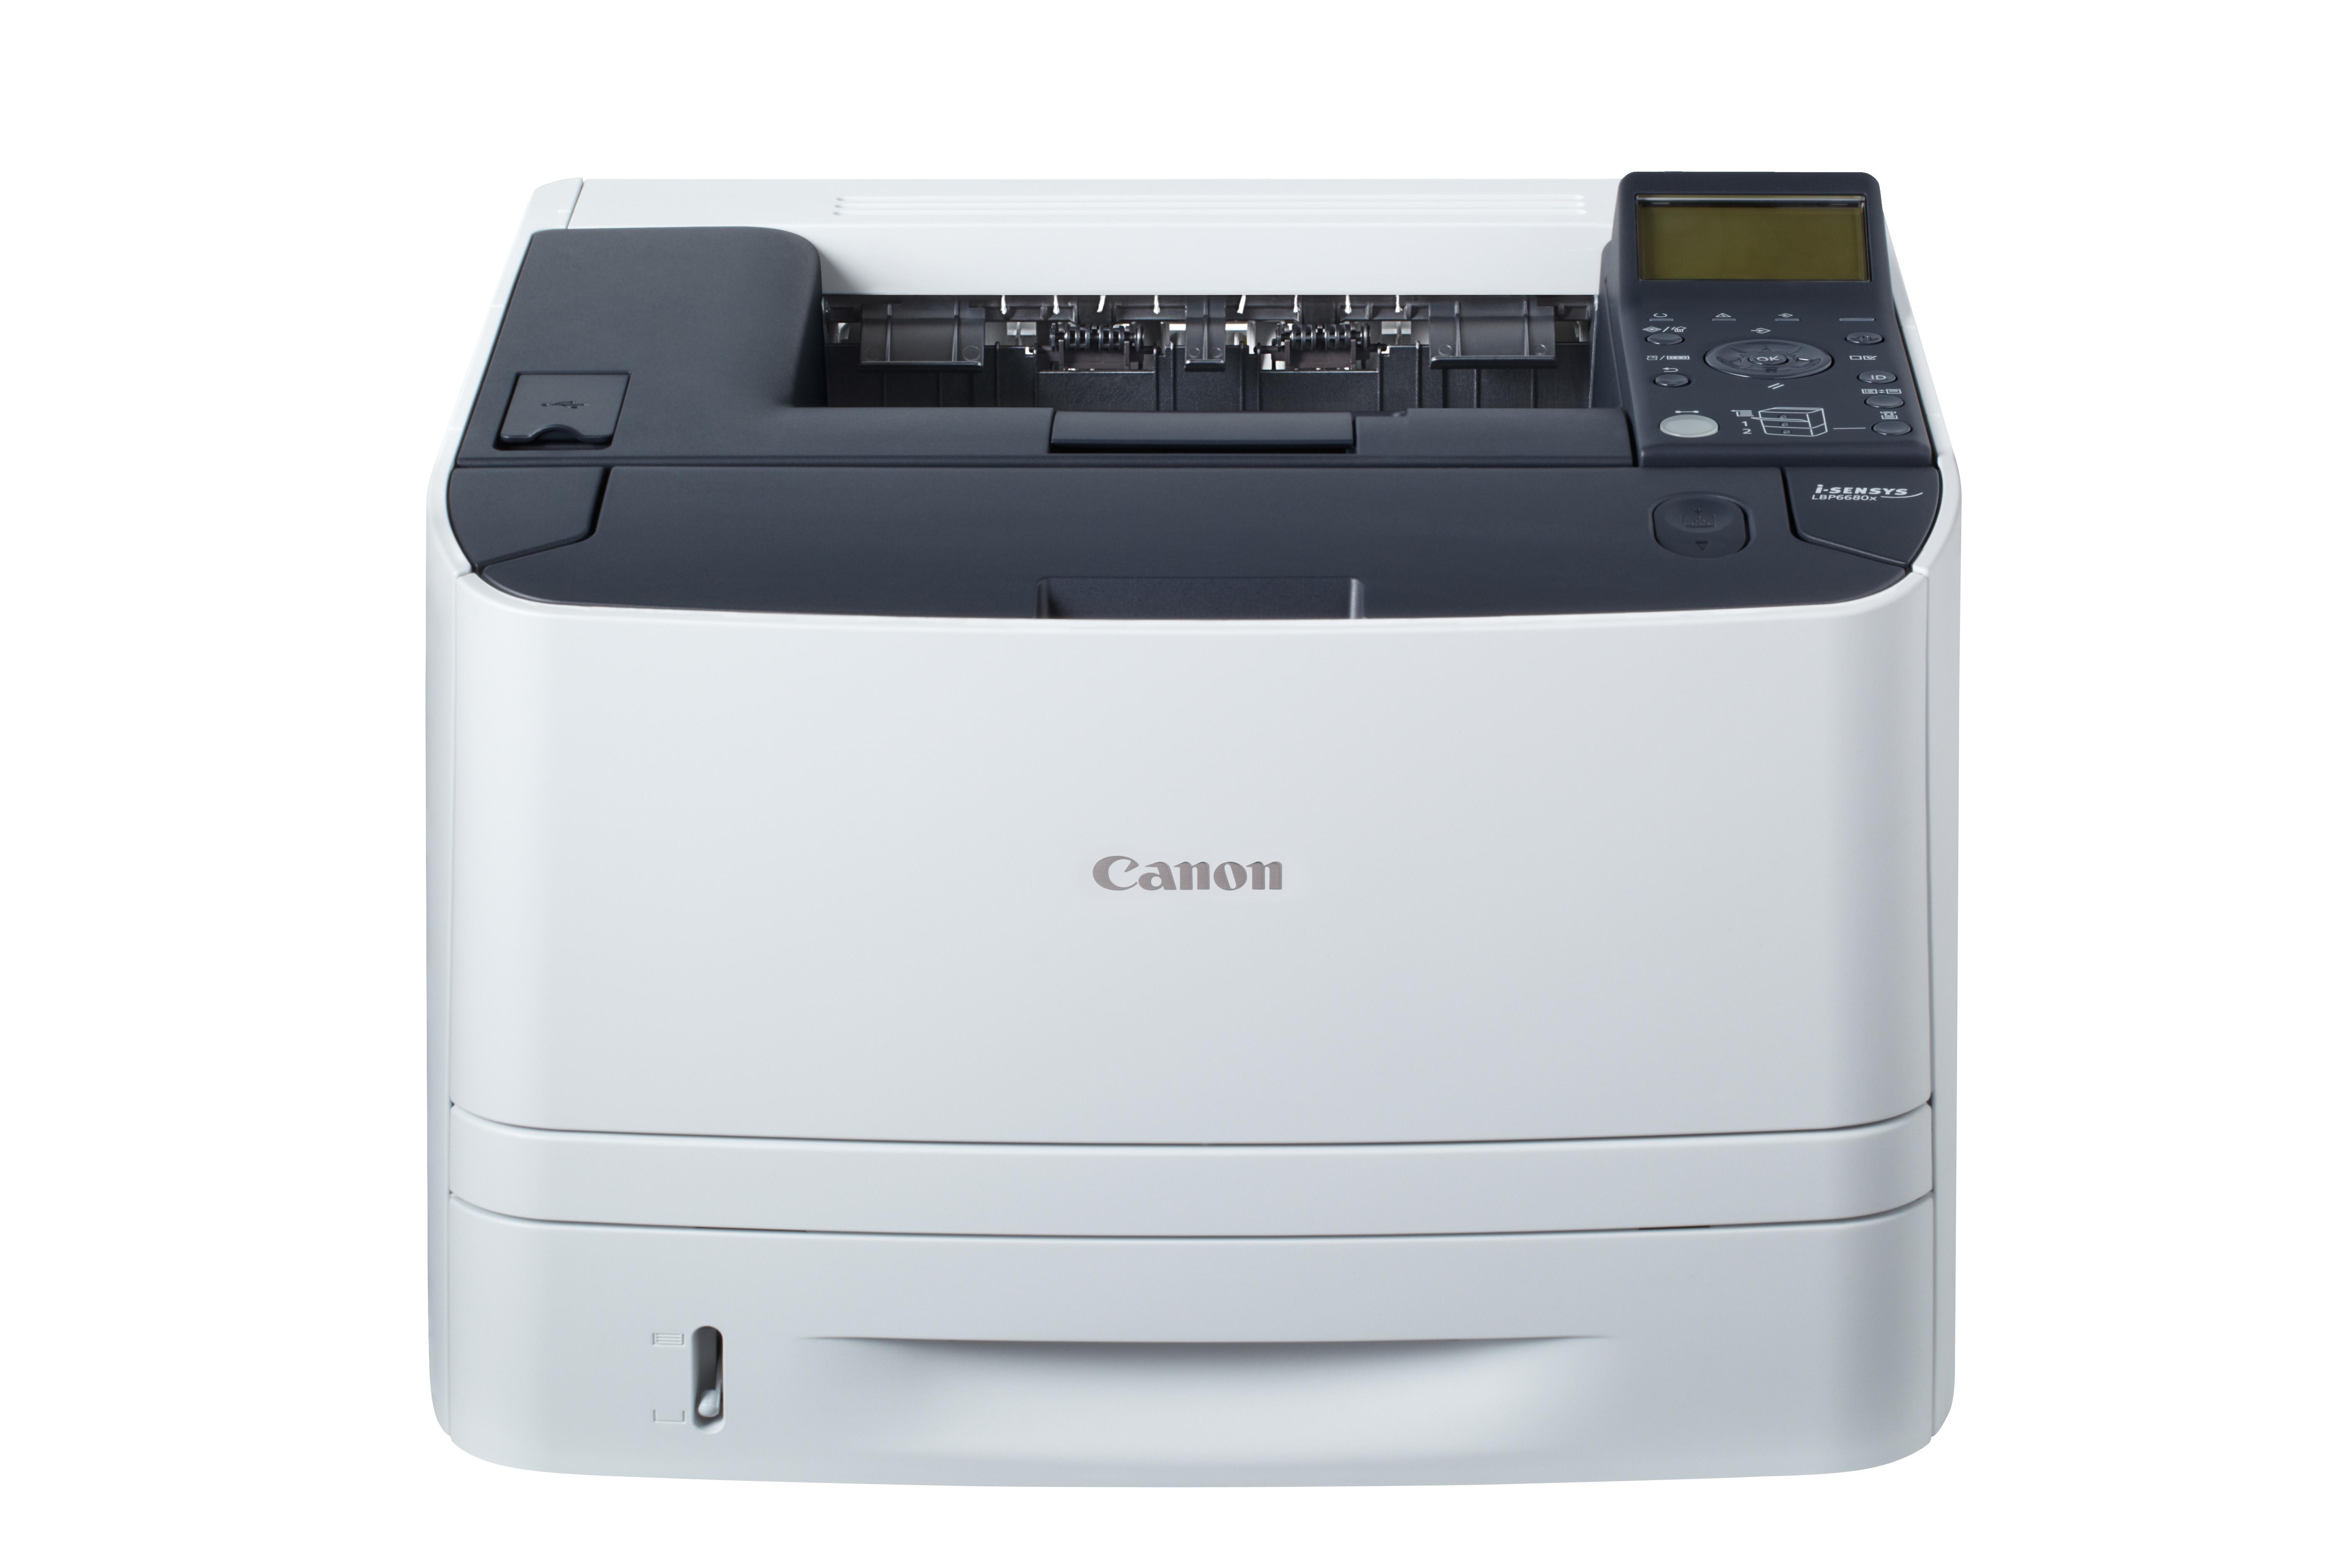 Canon i-SENSYS LBP6680X Mono Laser Printer 5152B002 - Refurbished